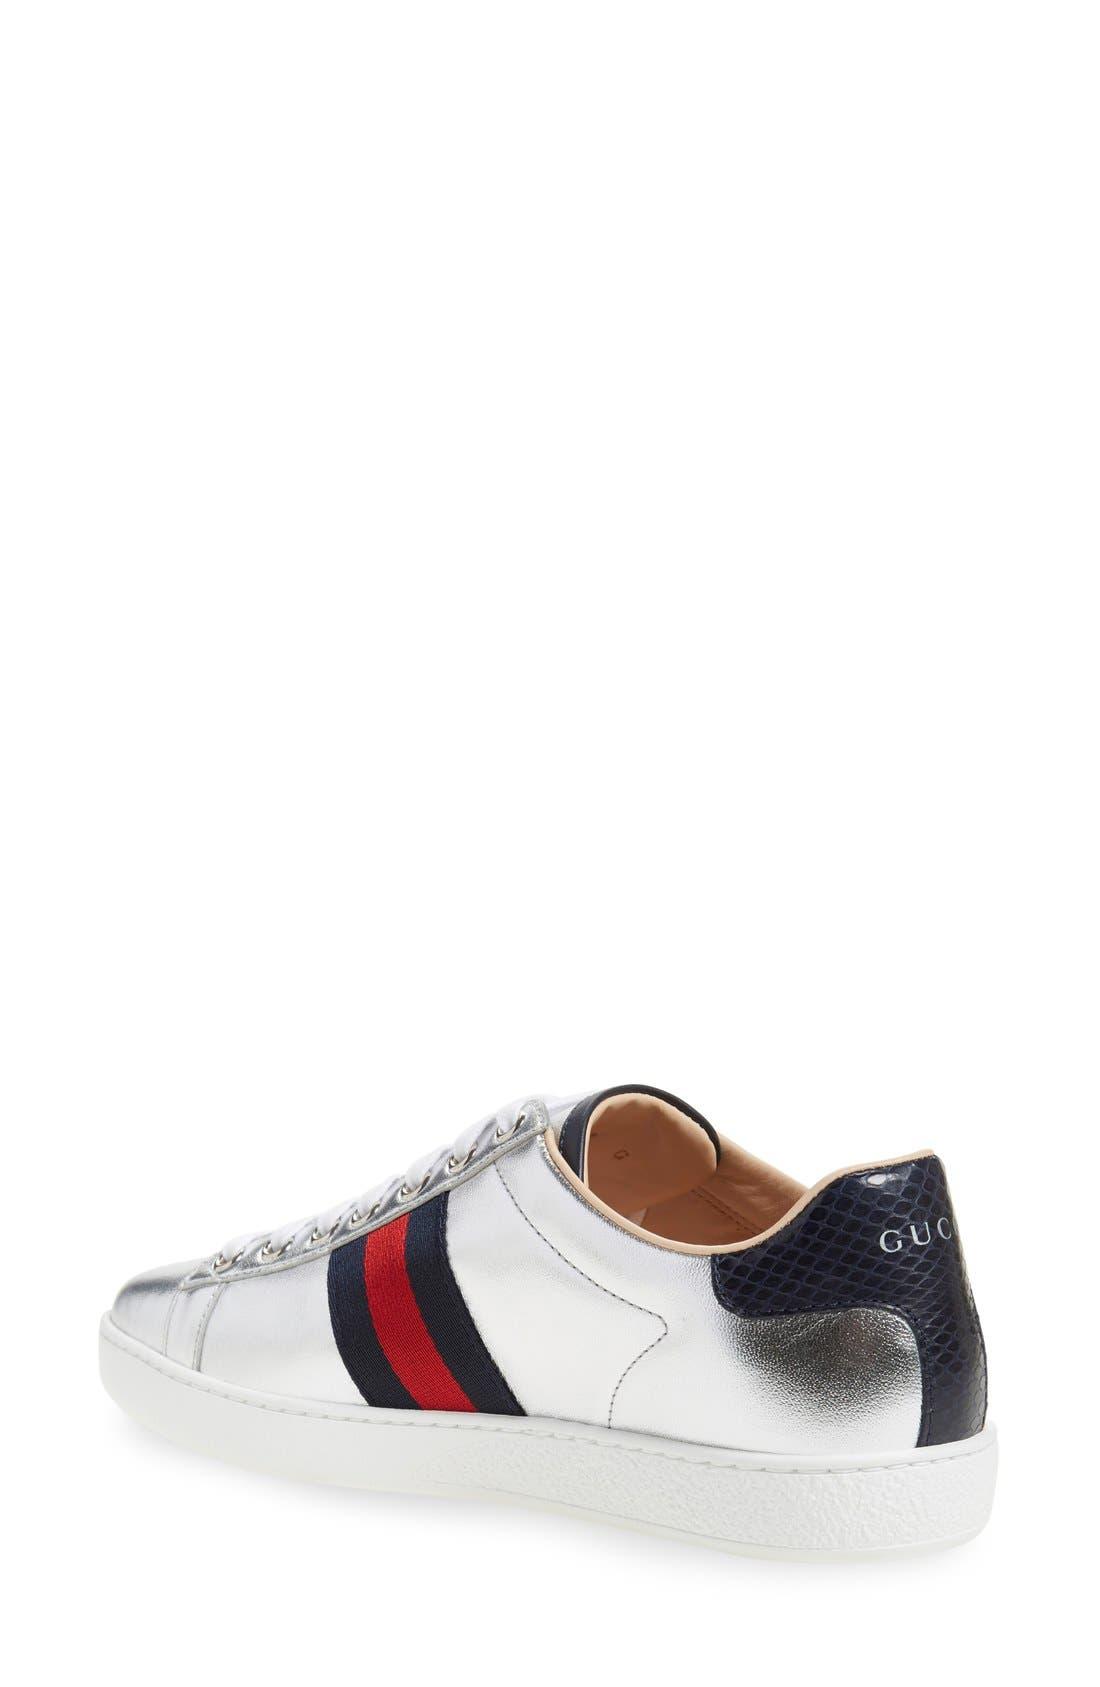 Alternate Image 2  - Gucci 'New Ace' Metallic Low Top Sneaker (Women)